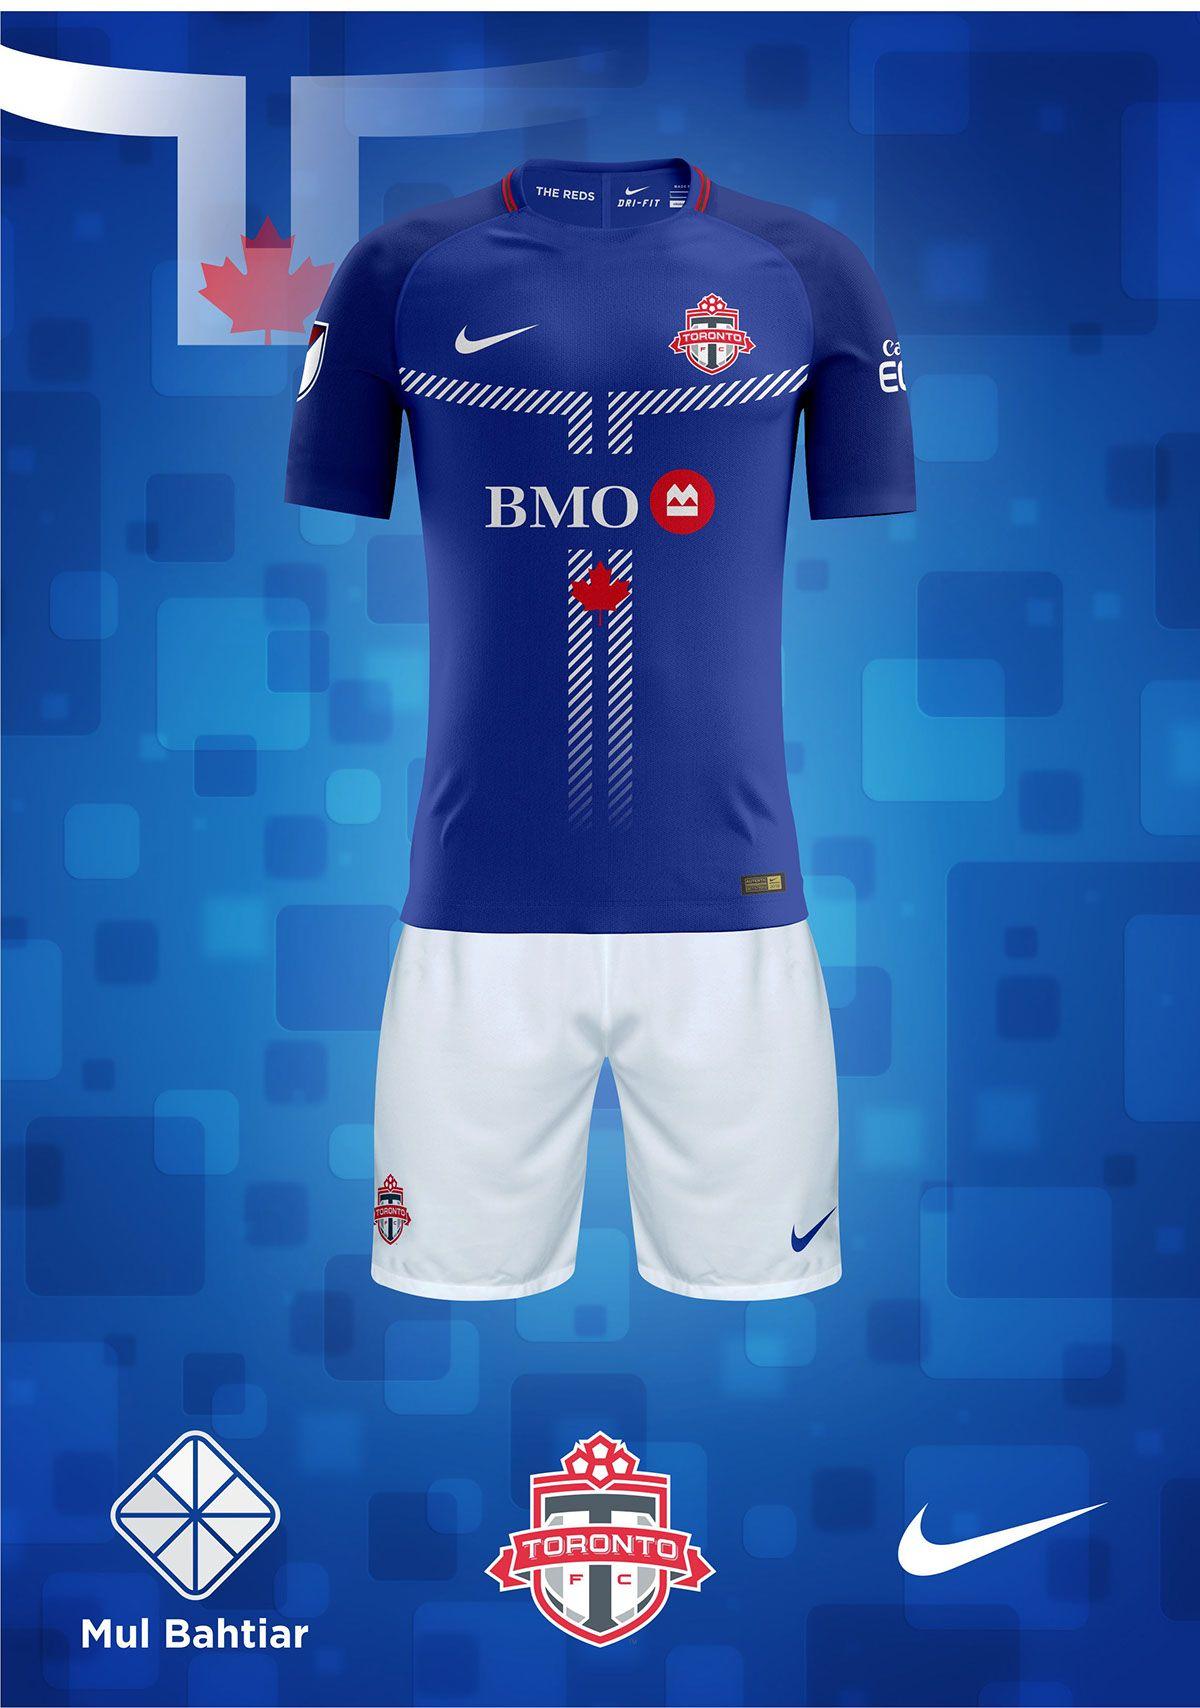 newest 3fbd4 06b39 Toronto F.C. 2018 Nike Fantasy Kits on Behance | Camisetas ...